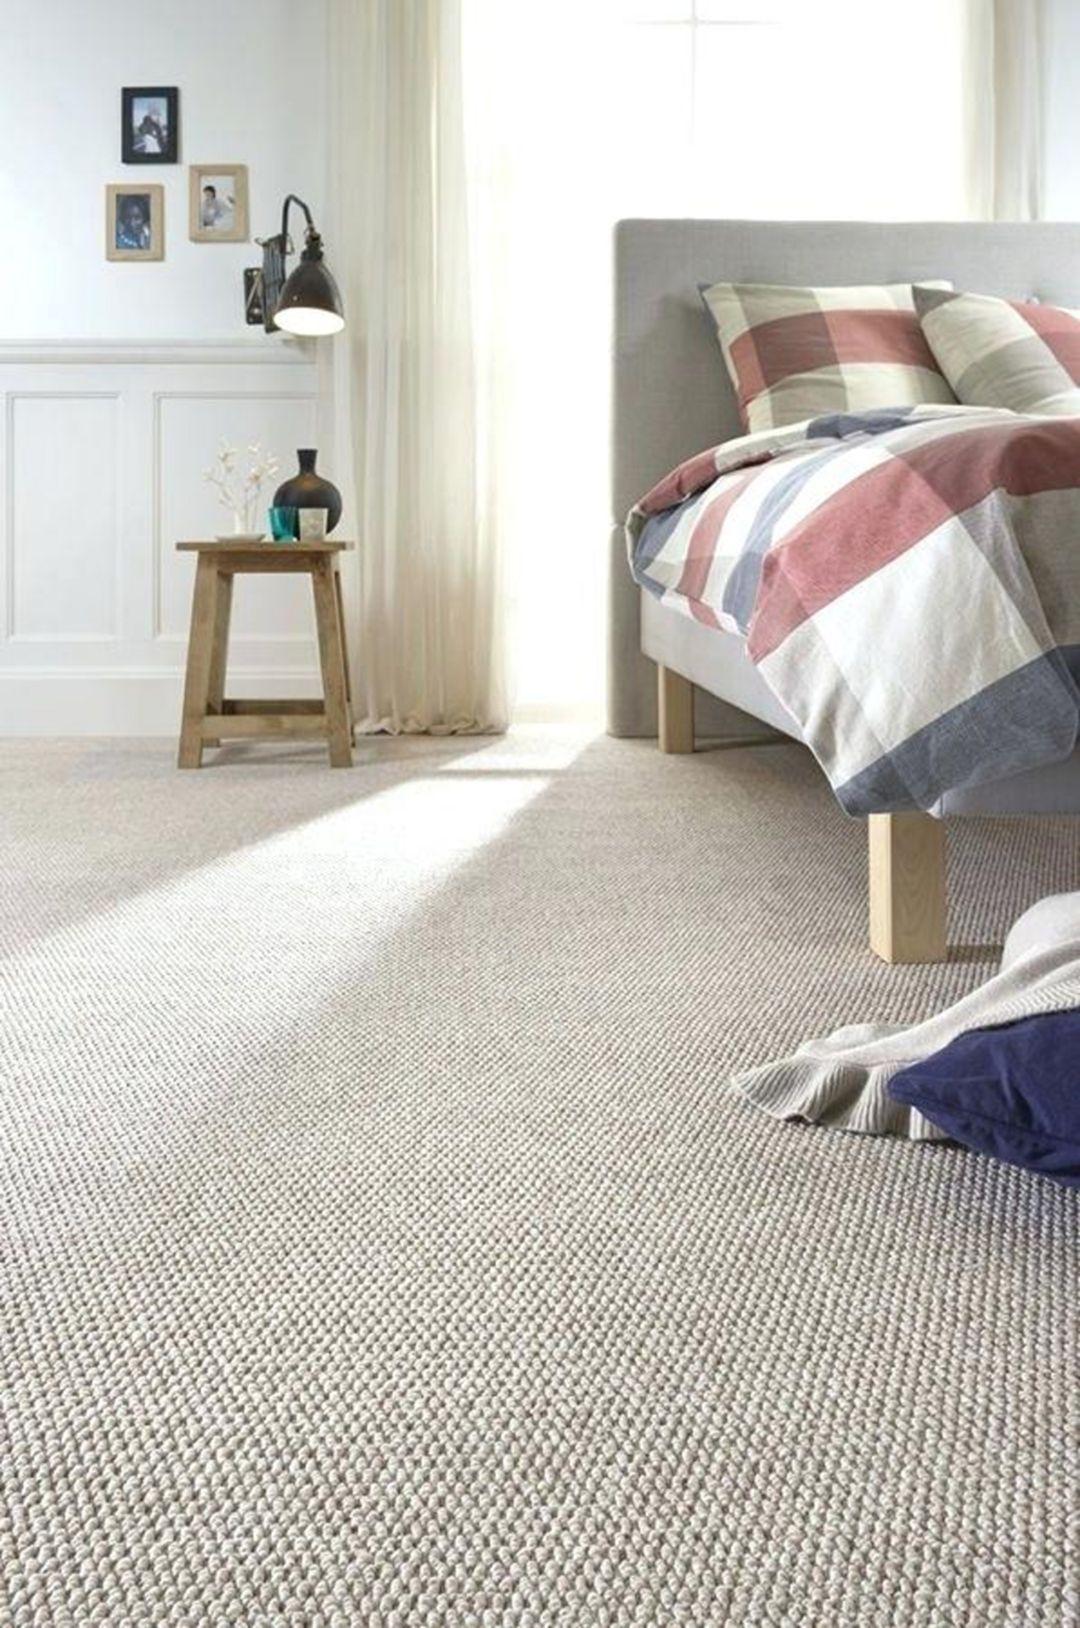 Pin By David On Wonderful Wollstonecraft In 2021 Grey Carpet Bedroom Bedroom Carpet Bedroom Flooring